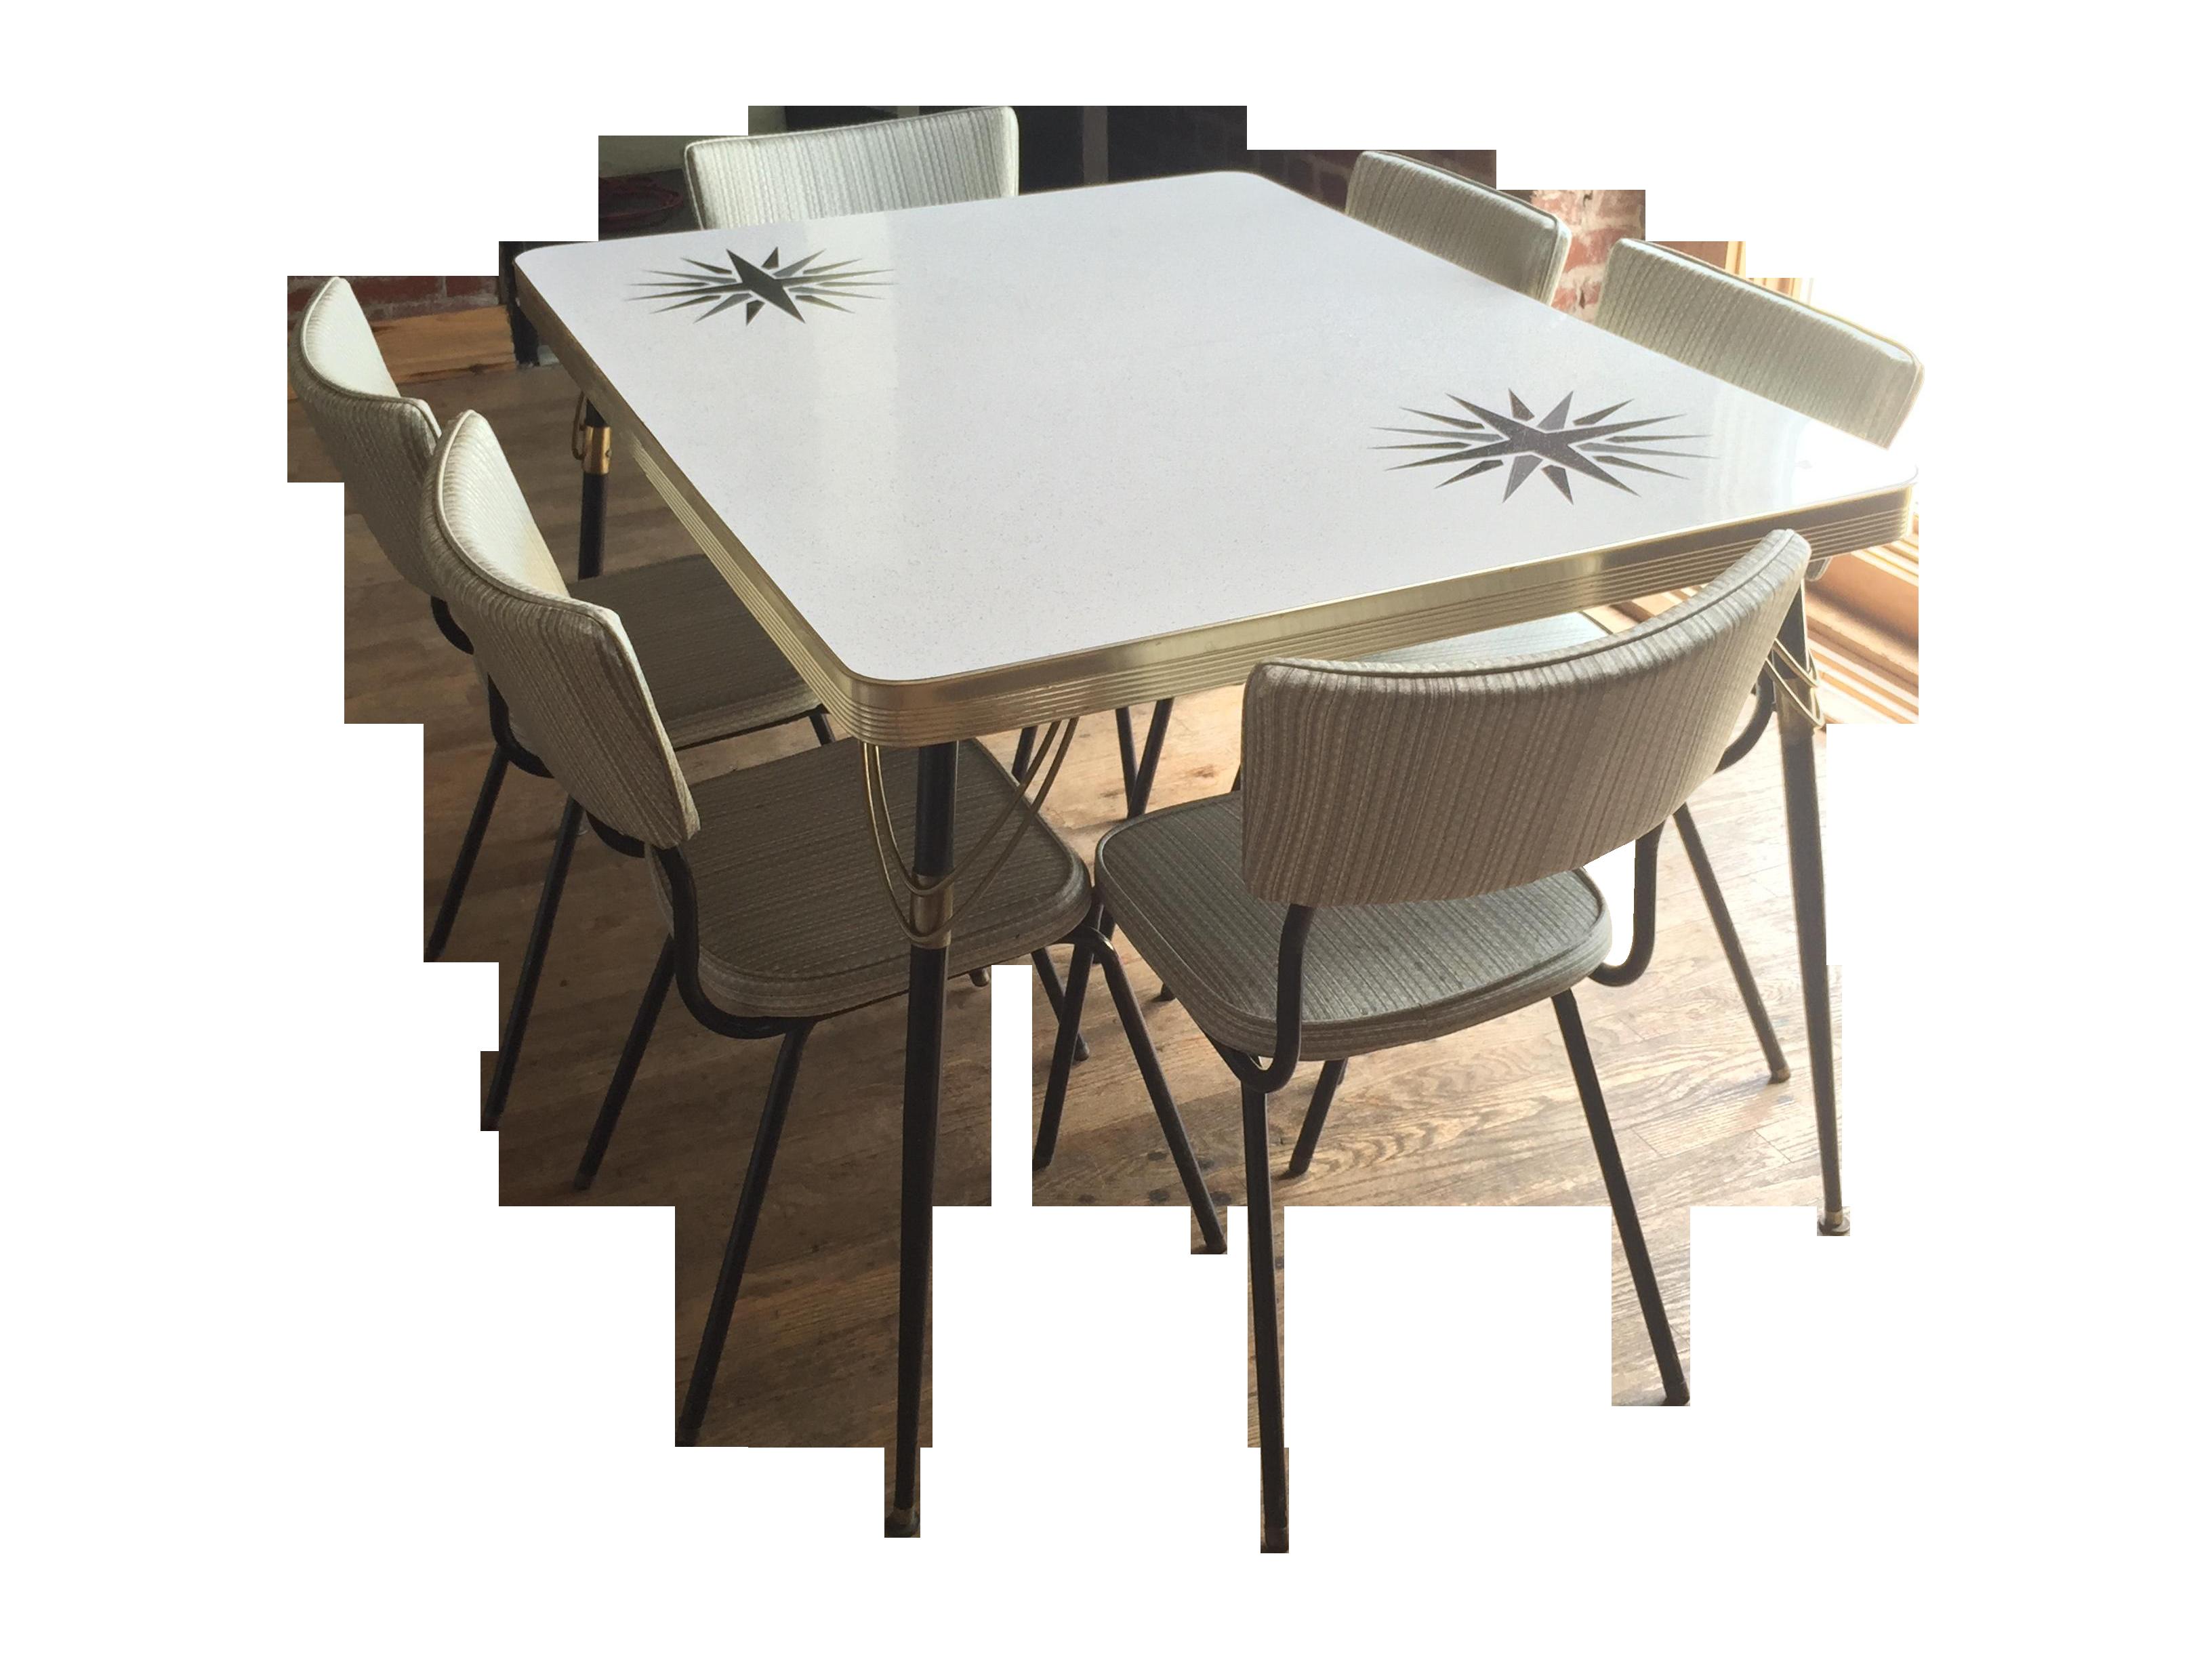 Strange 1960S Vintage Formica Dining Set Creativecarmelina Interior Chair Design Creativecarmelinacom